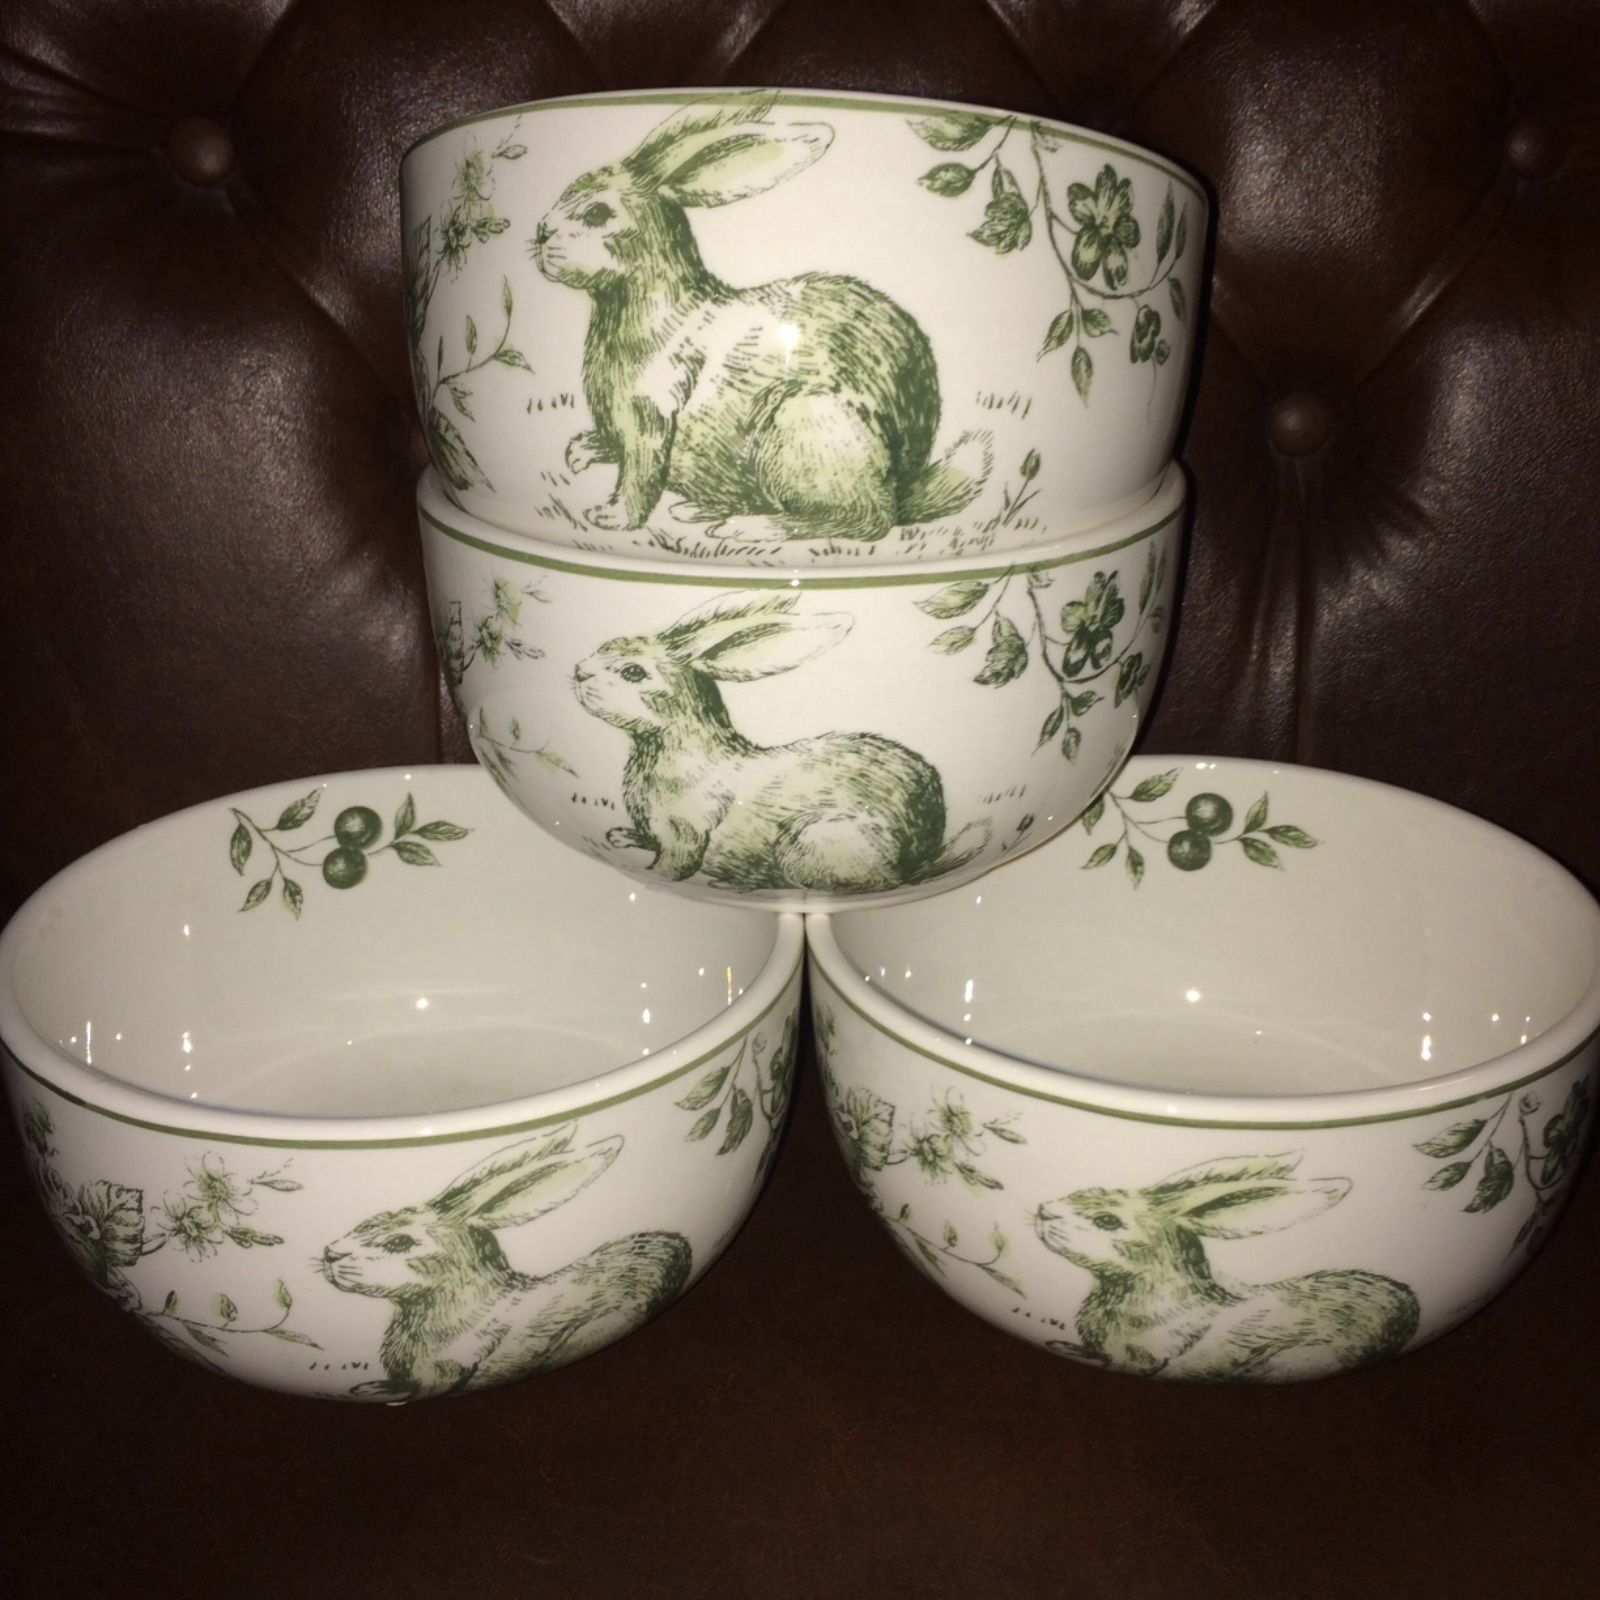 Maxcera Green White Toile Bunny Rabbit and 50 similar items